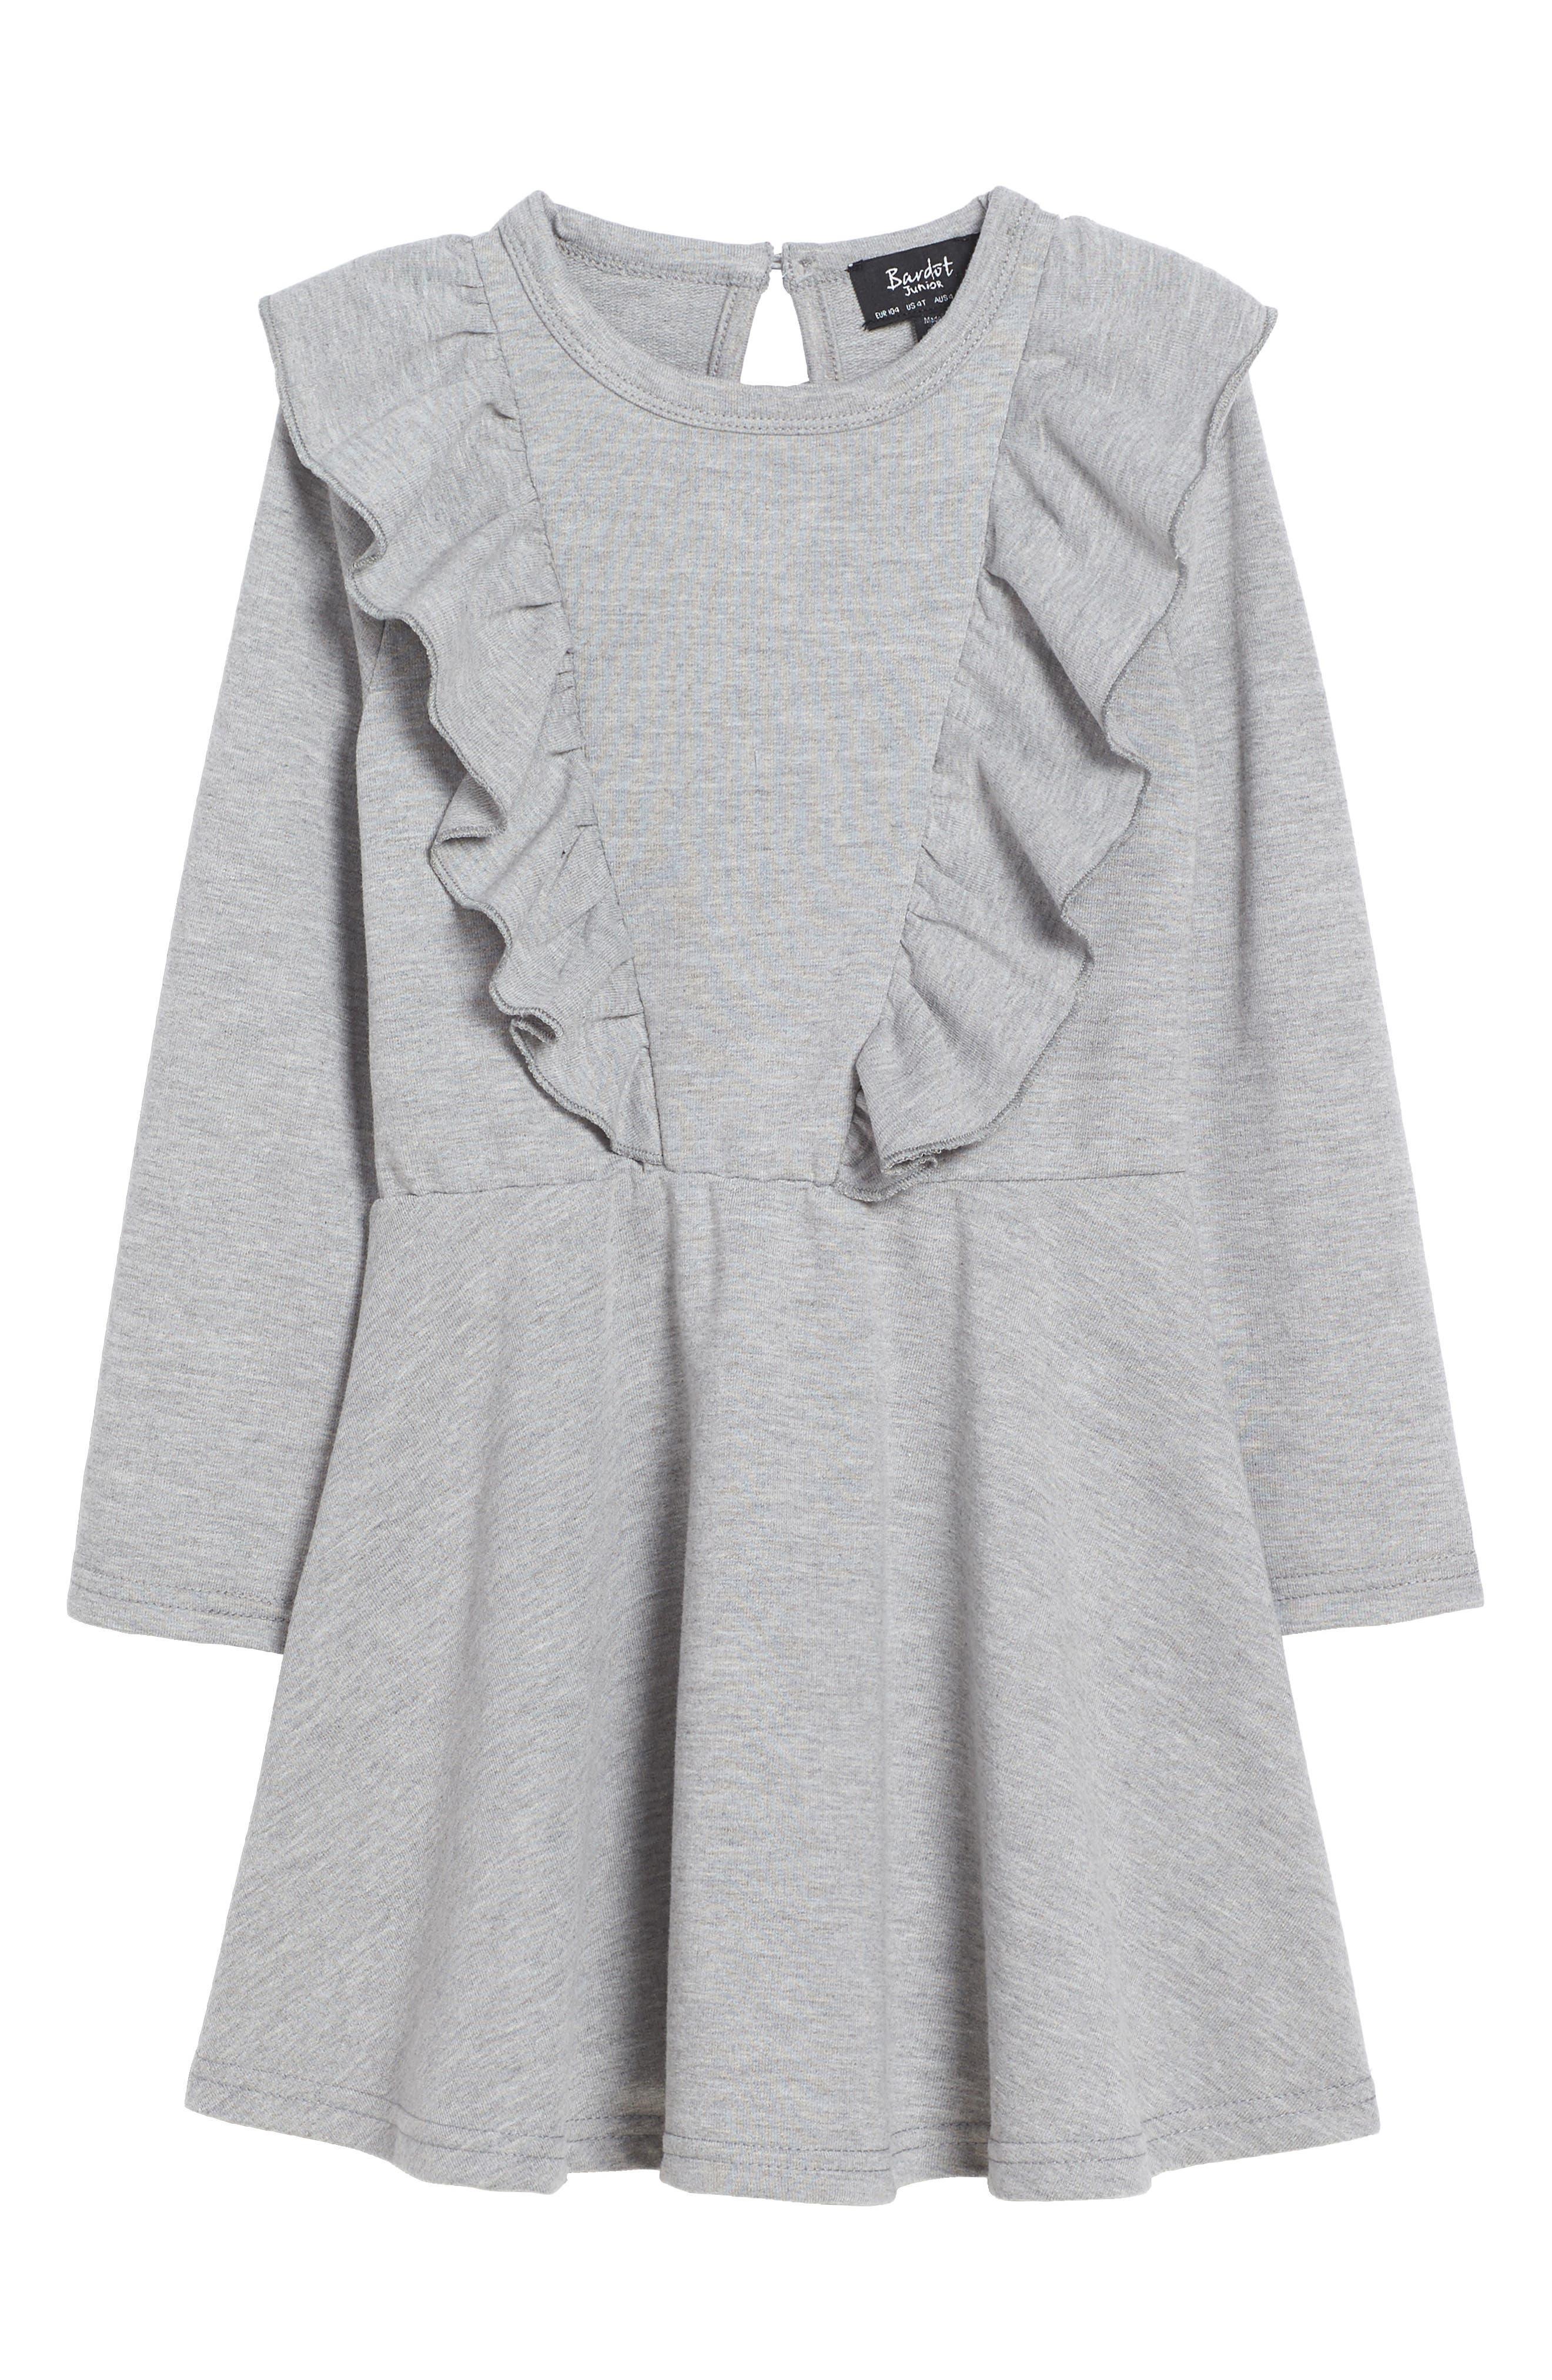 Main Image - Bardot Junior Frill of It Ruffle Dress (Big Girls)